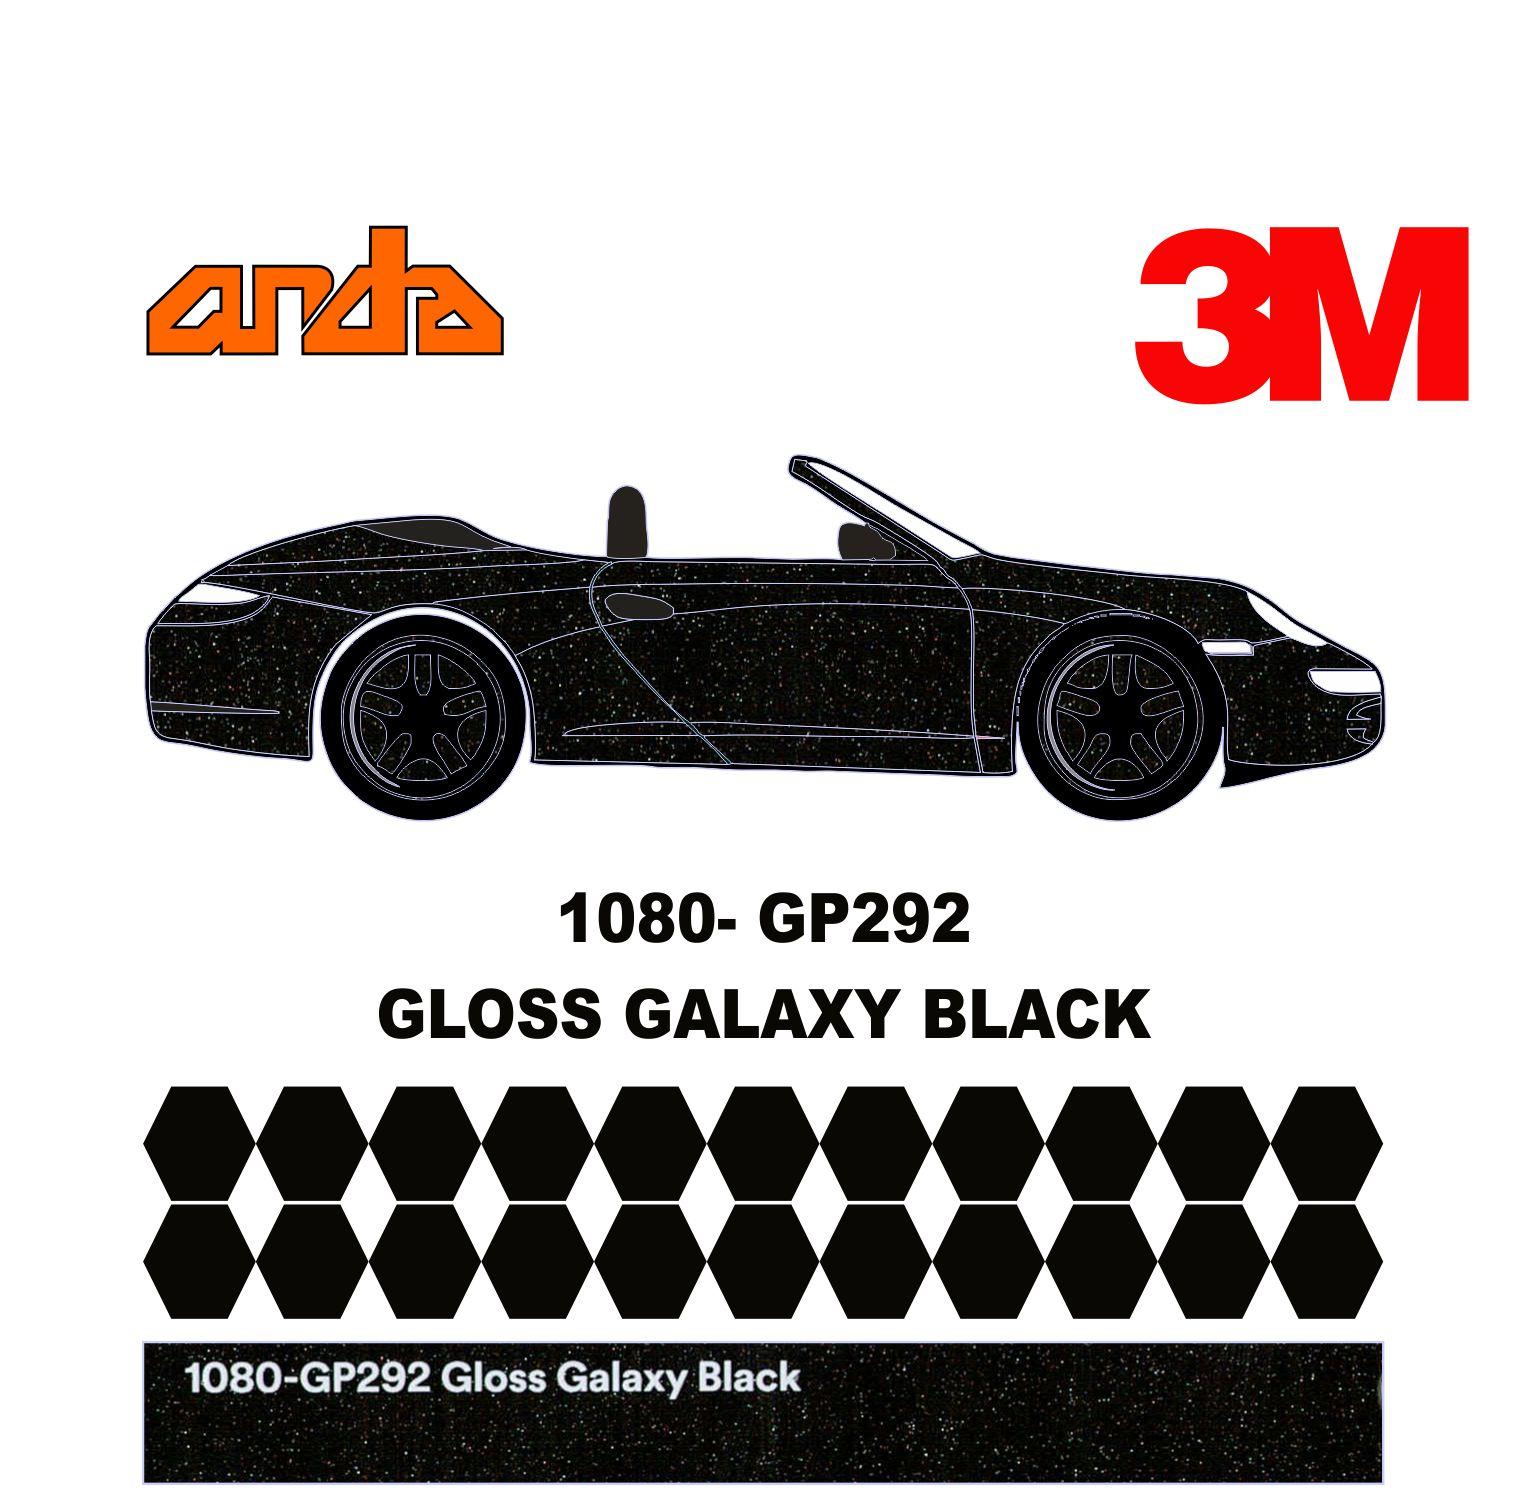 3M 1080-G292 Parlak Galaxy Black 1